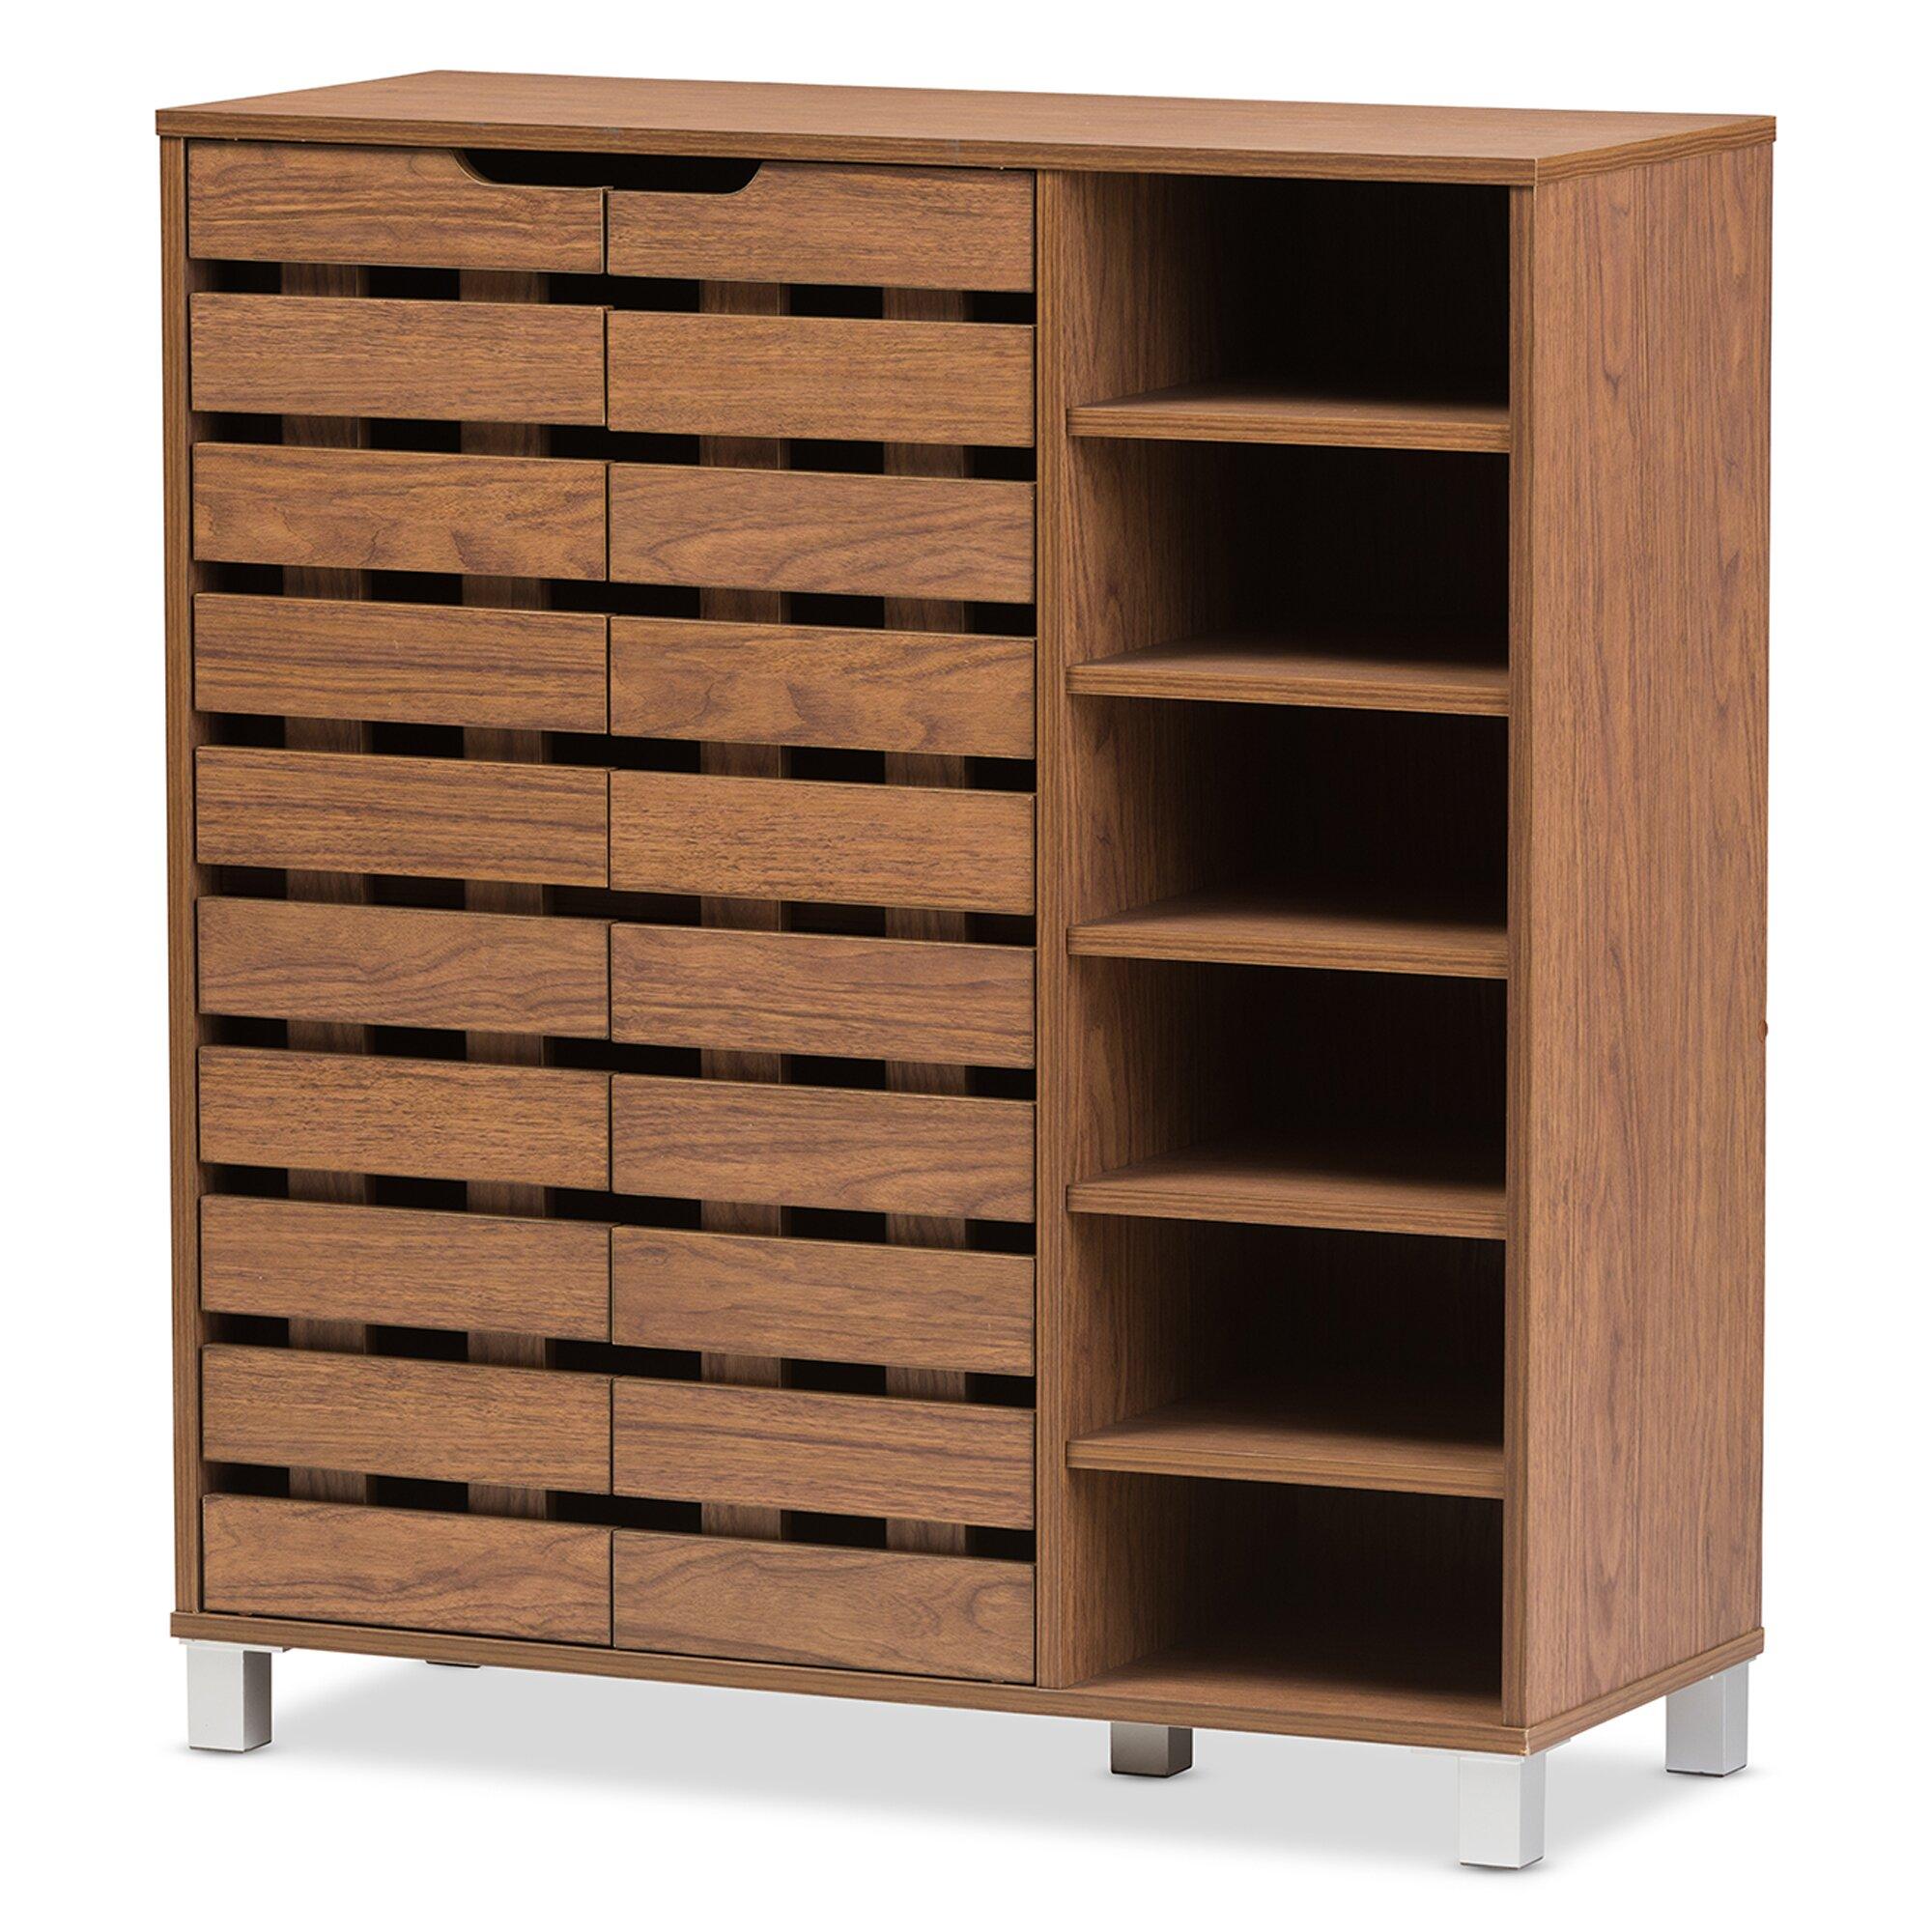 Storage Cabinet Wood Wholesale Interiors Baxton Studio Beppe 18 Pair Shoe Storage